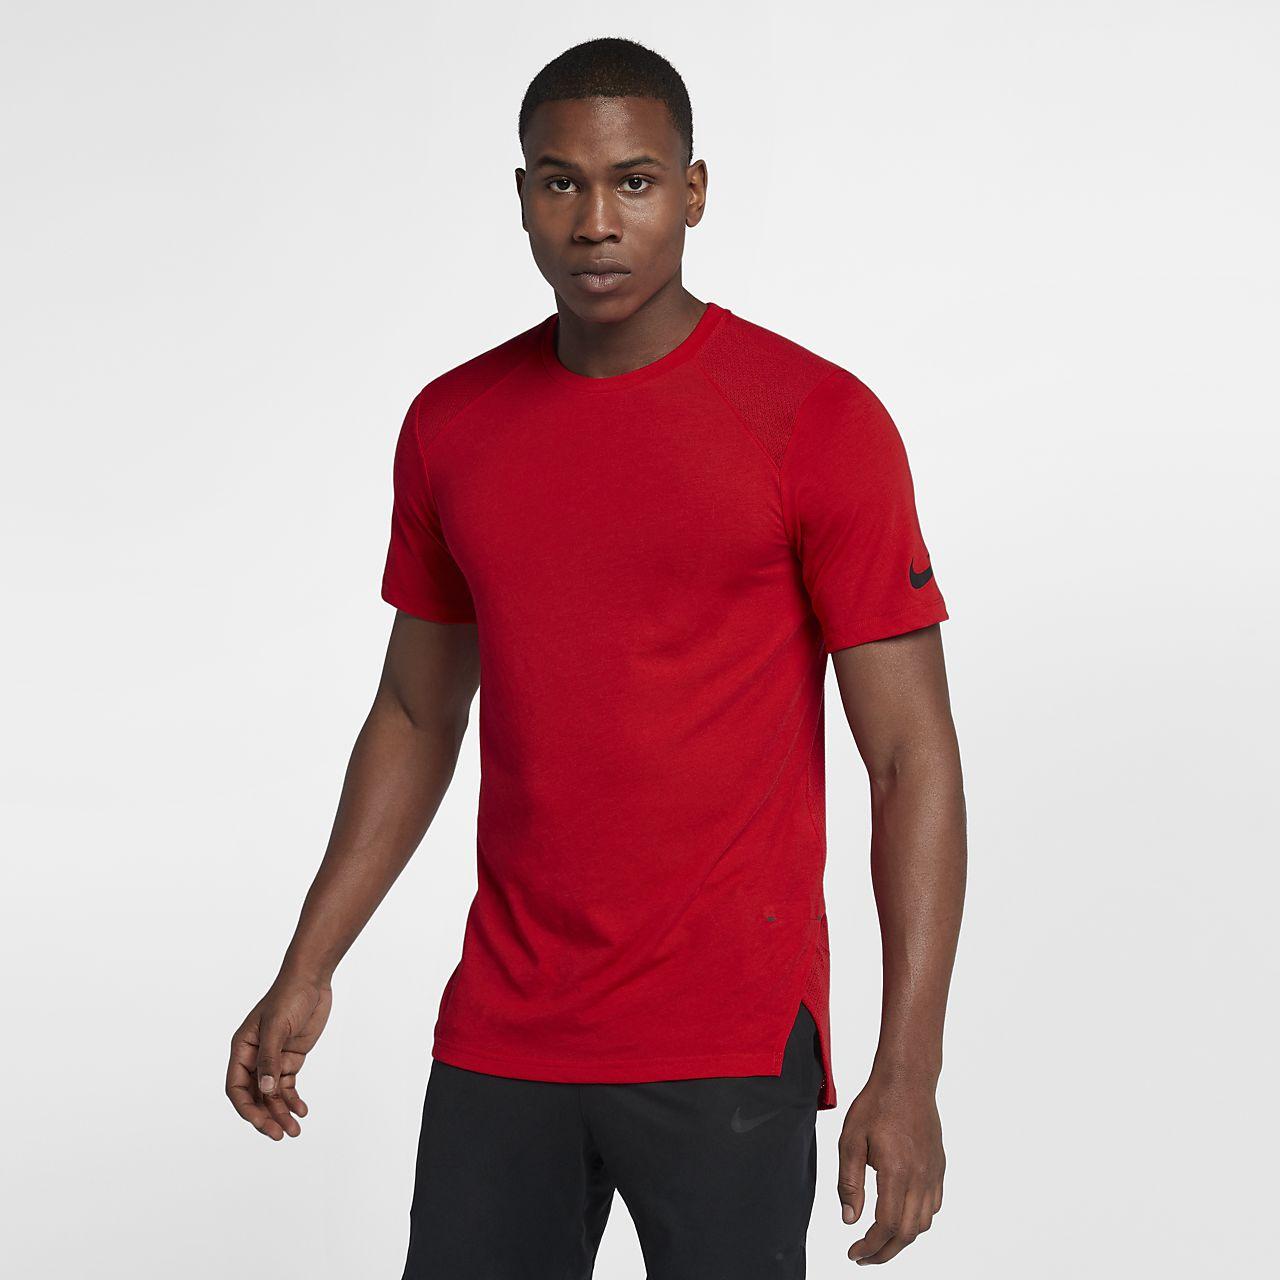 fb1825eb Nike Breathe Elite Men's Short-Sleeve Basketball Top. Nike.com GB